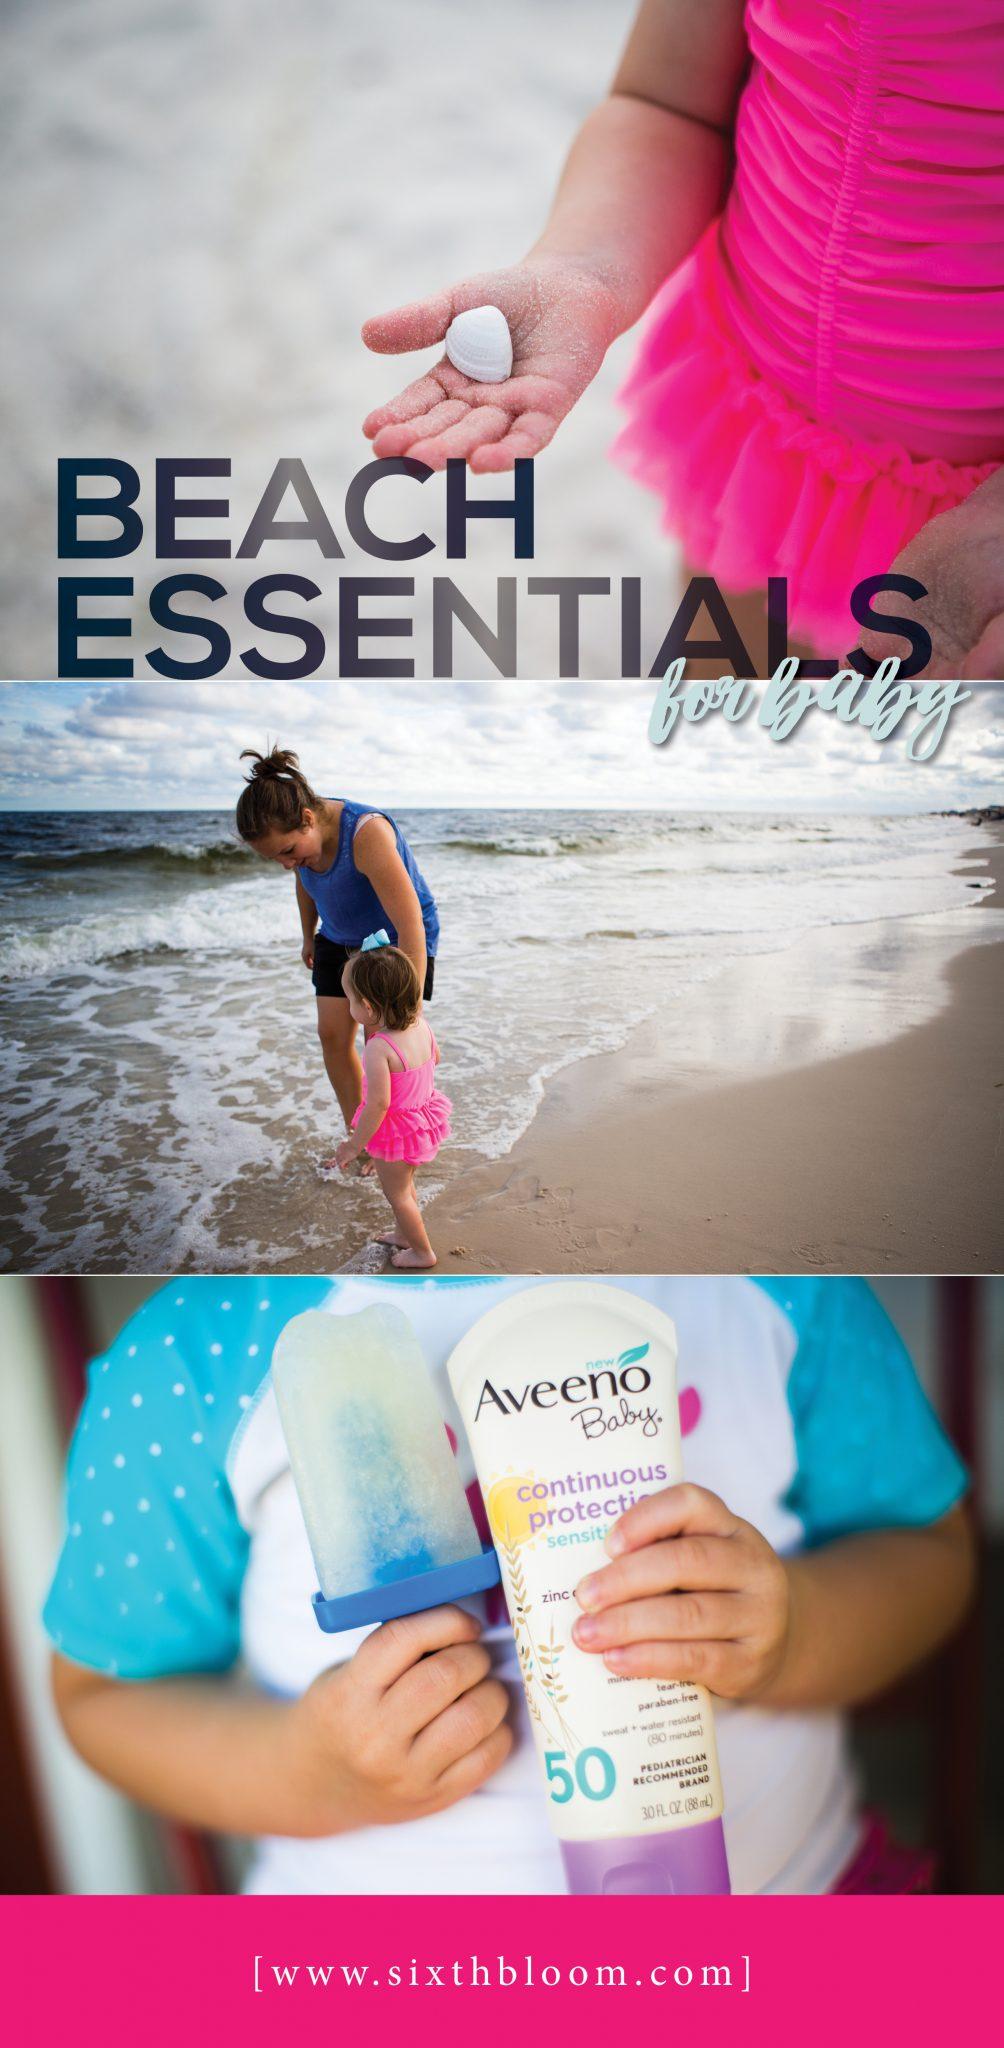 beach essentials for baby